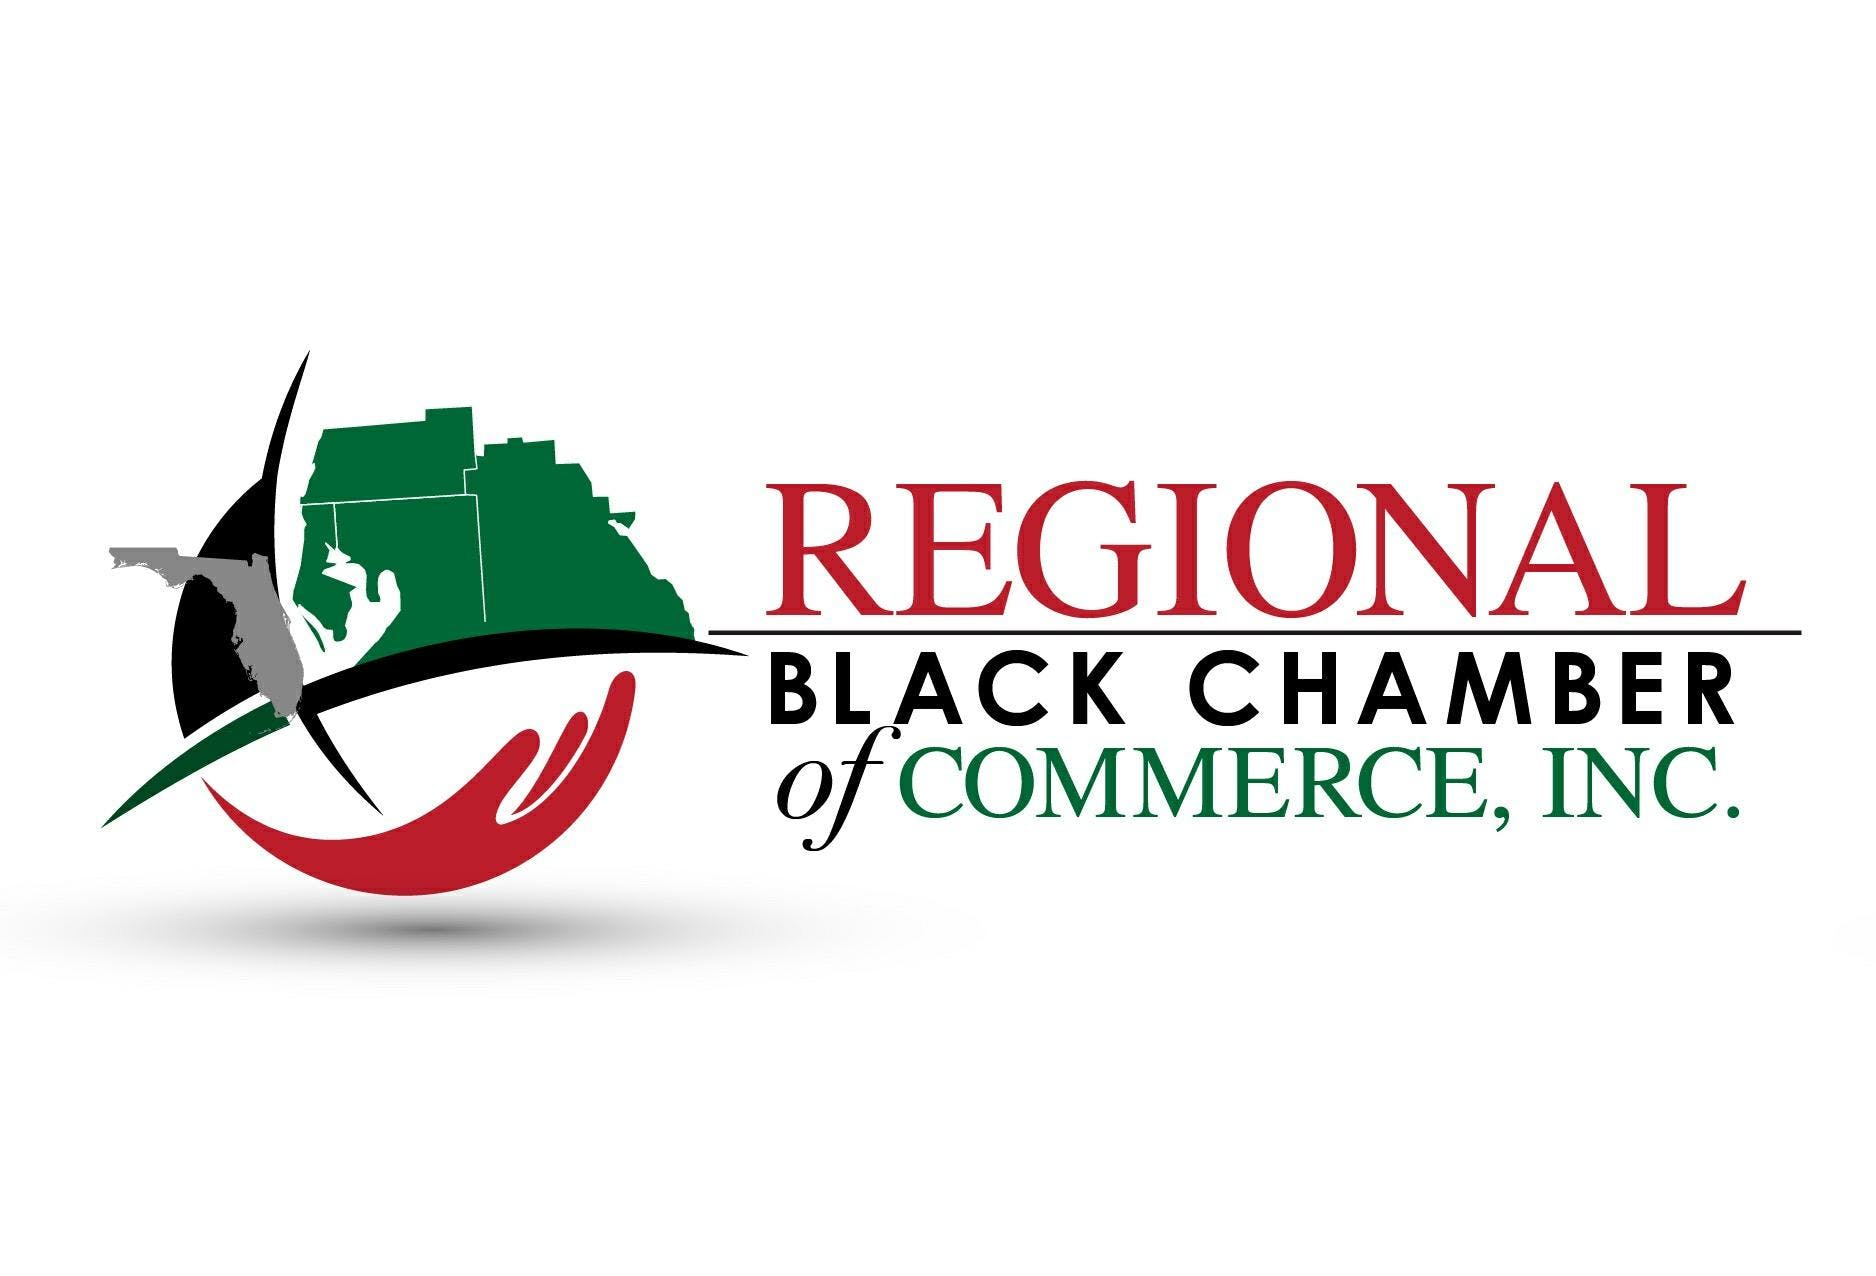 Regional Black Chamber Minority Business Enterprise Certification